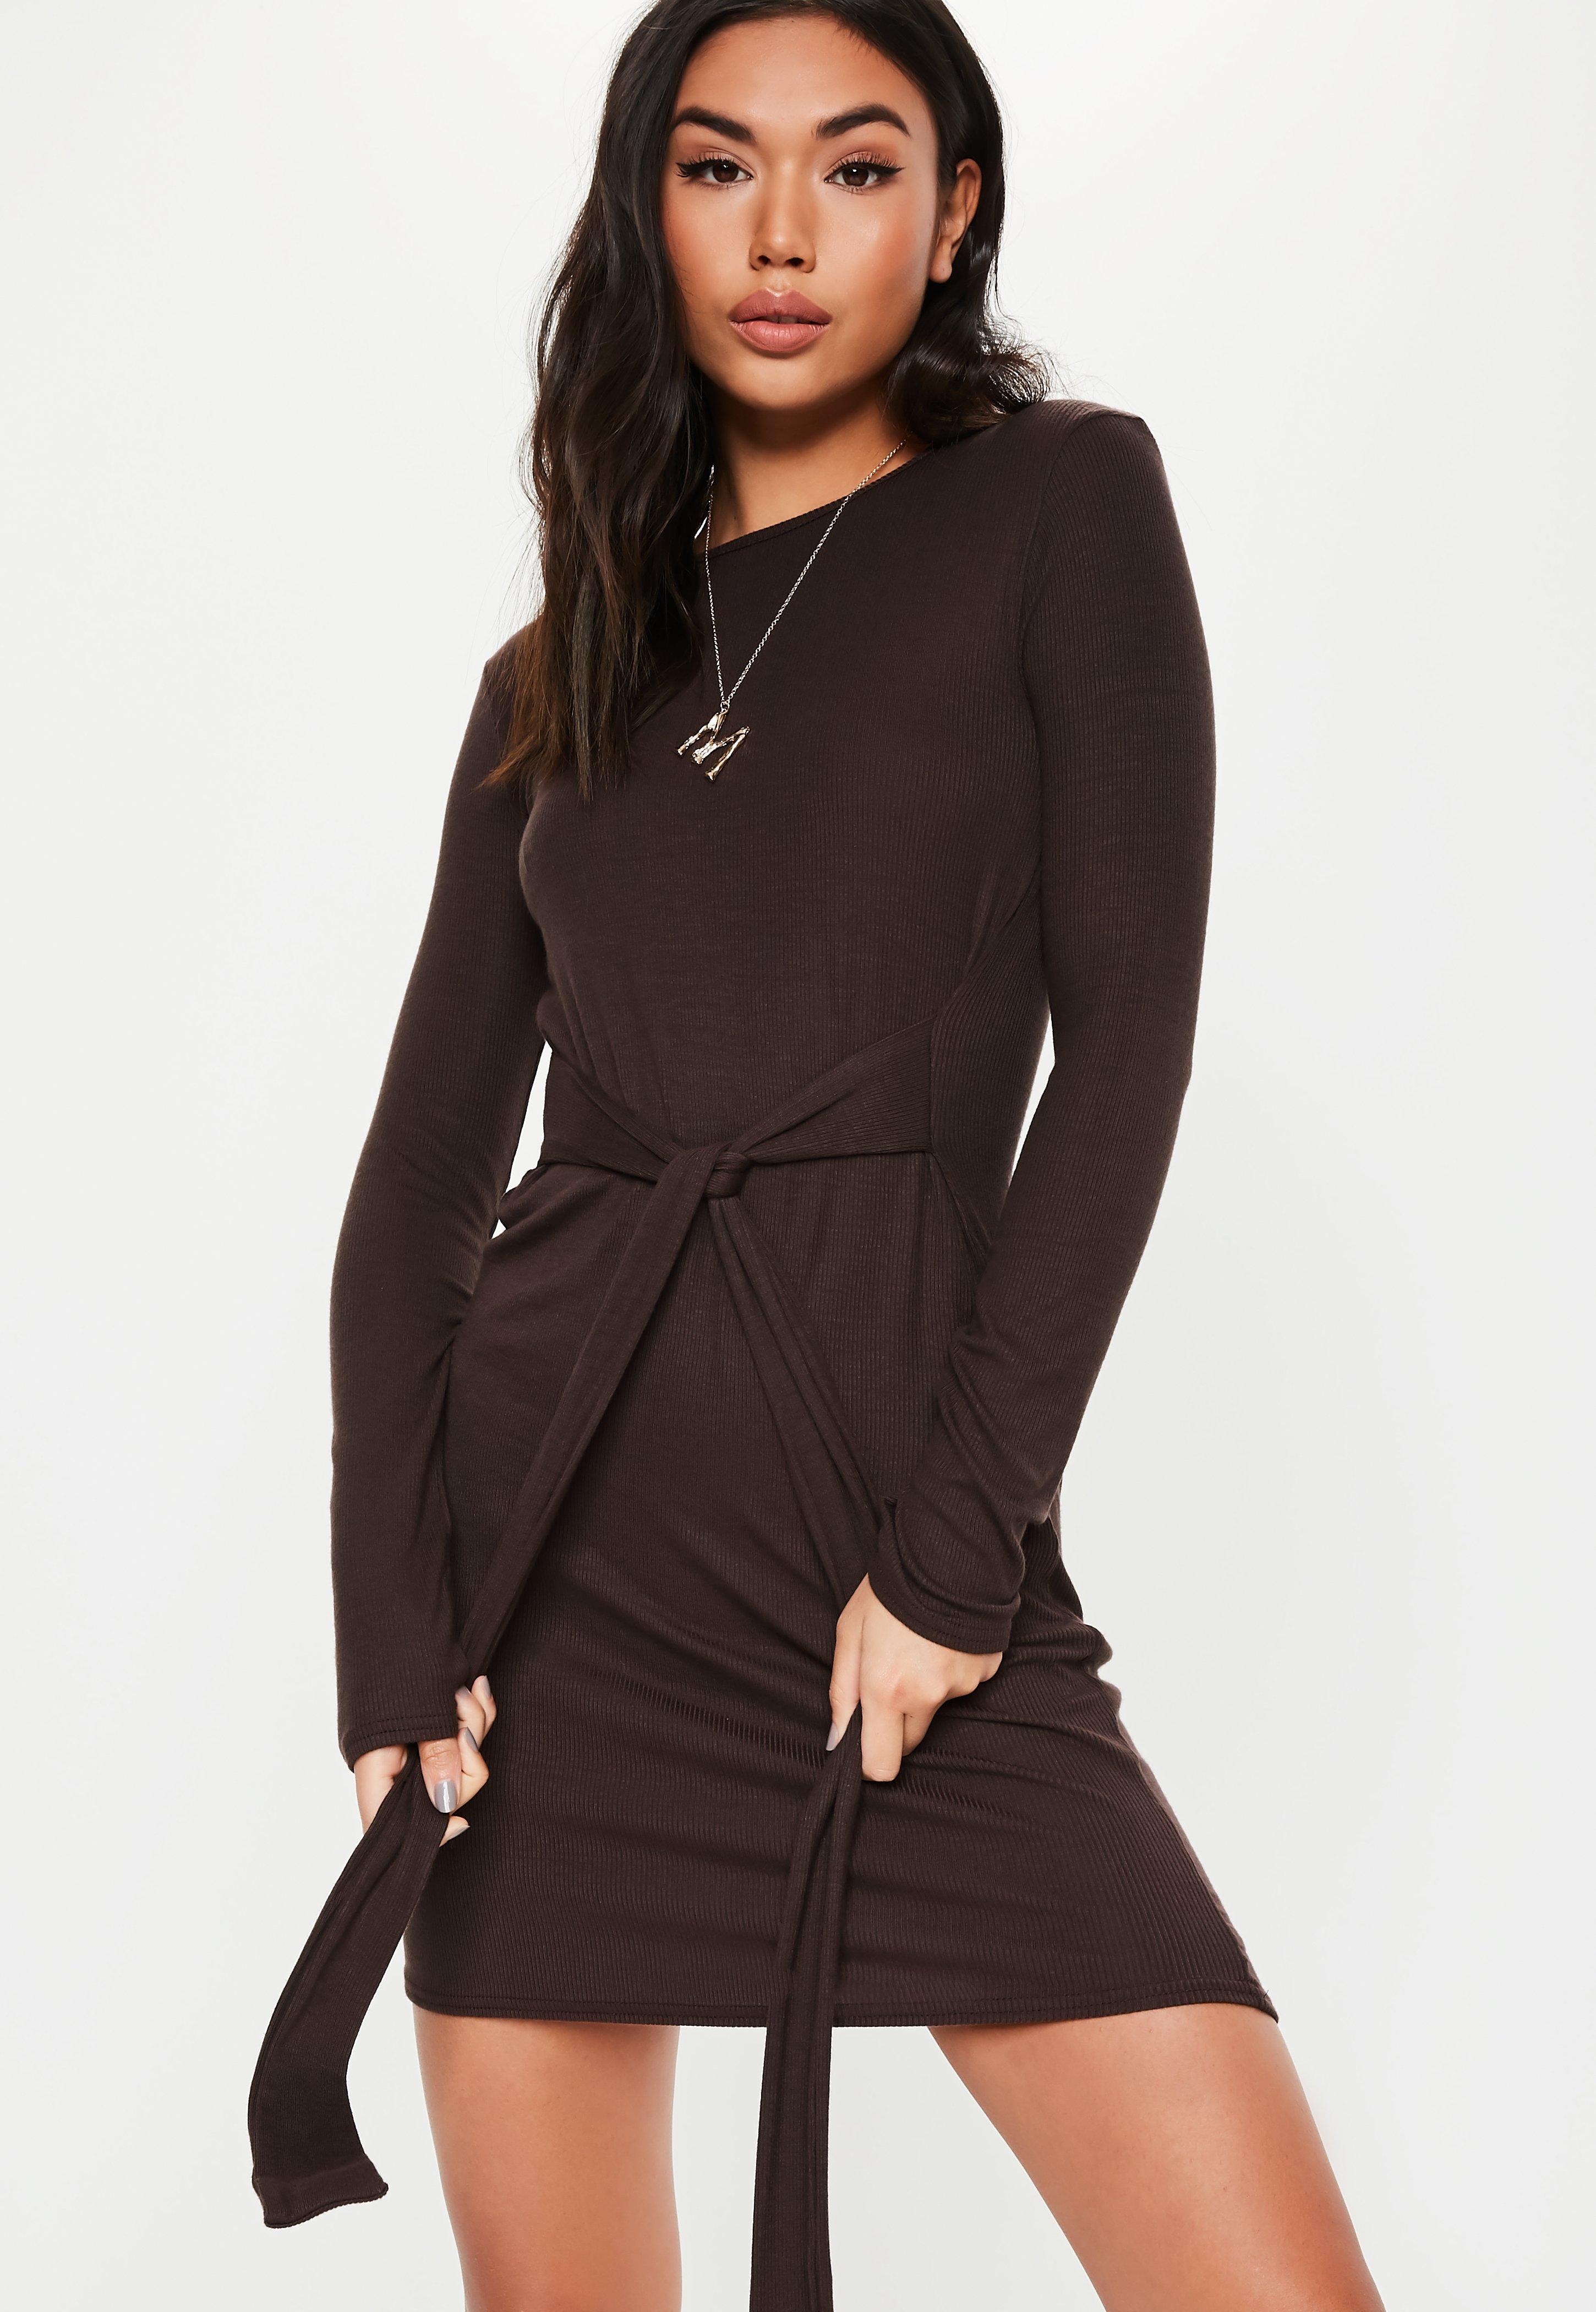 Robe t-shirt   Robe tee shirt   imprimée femme - Missguided 9c375769ab1